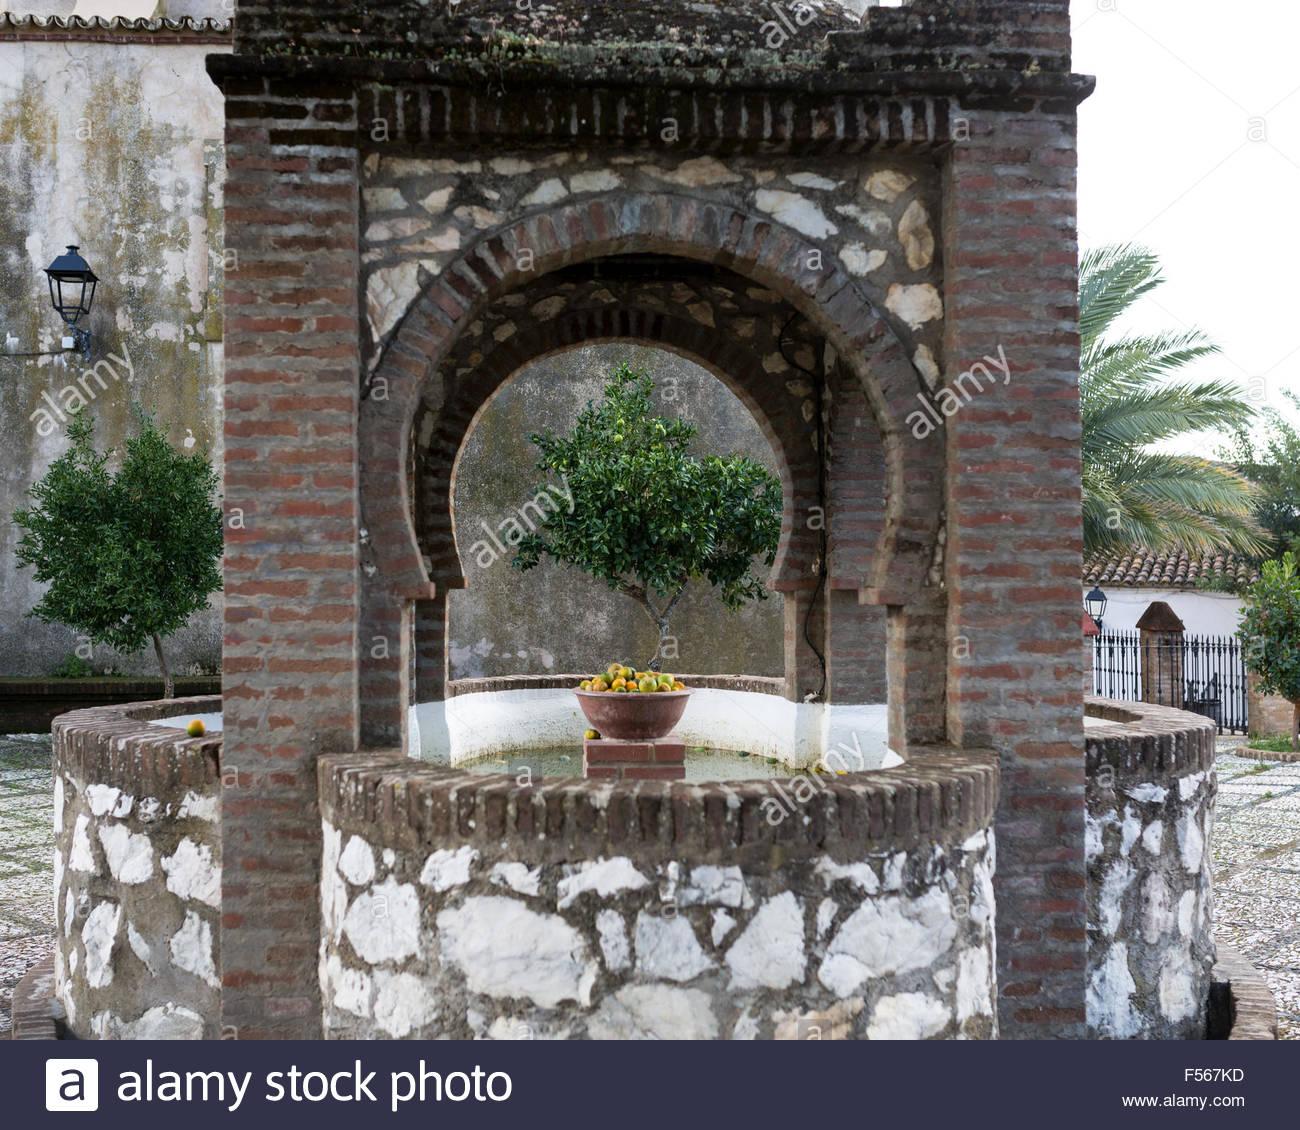 Water WellSan Juan Bautista Church courtyard in Linares, Sierra de Huelva, Andalusia Spain - Stock Image